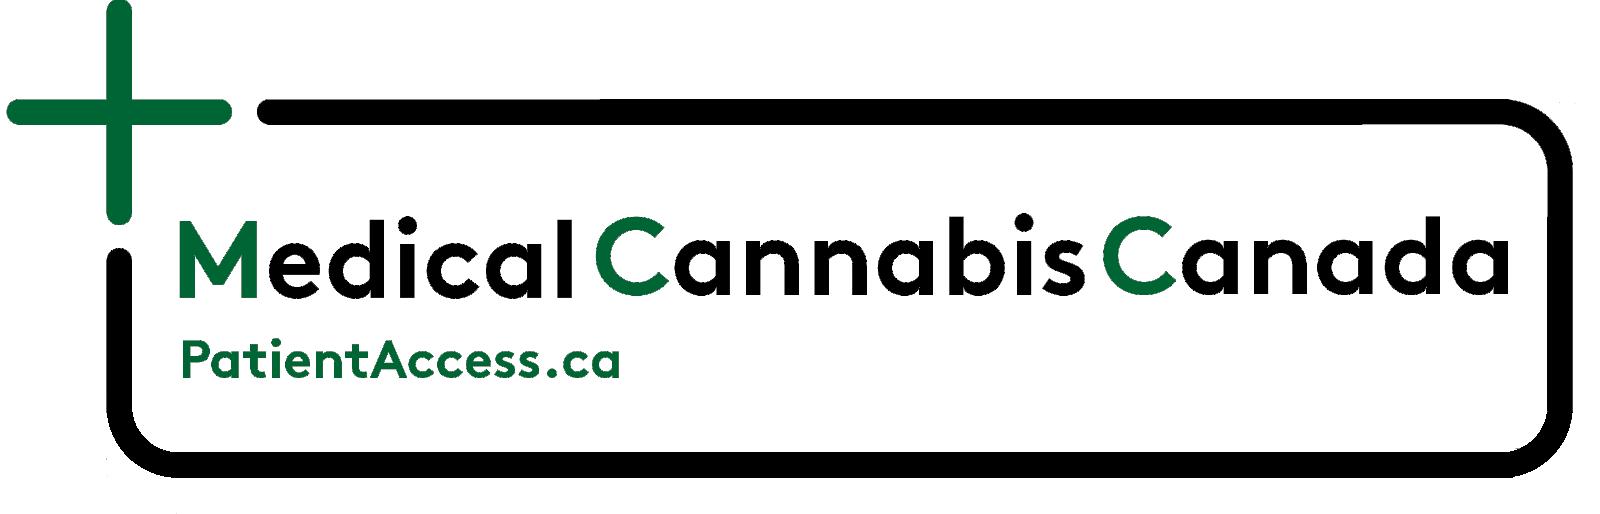 Medical Cannabis Canada - Cananbis Médicale Canada